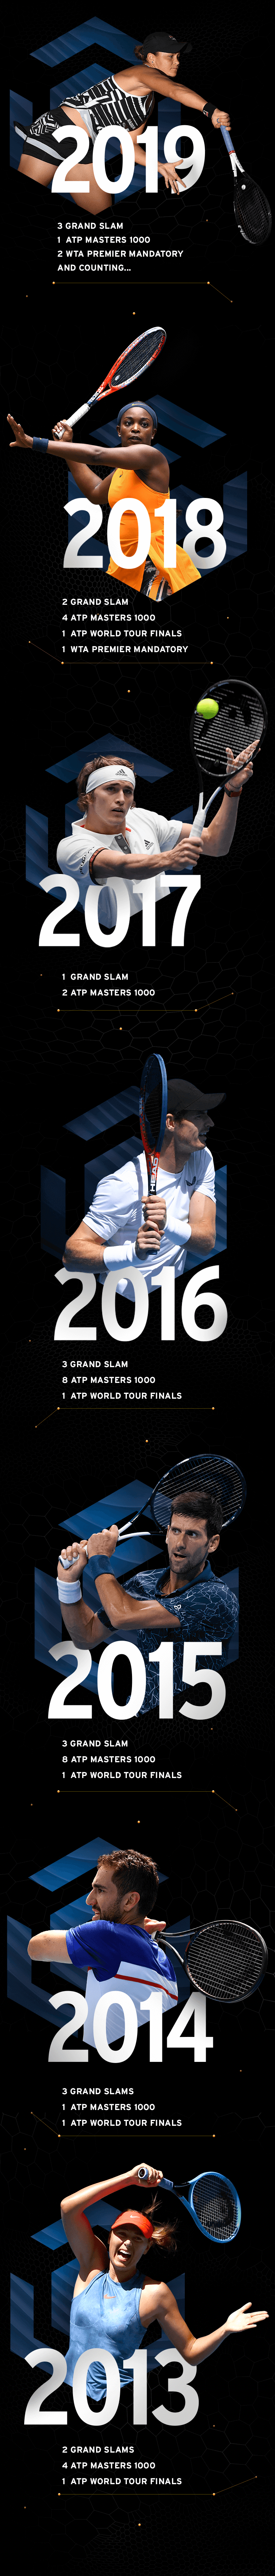 HEAD Tennis –Graphene 360+ winners